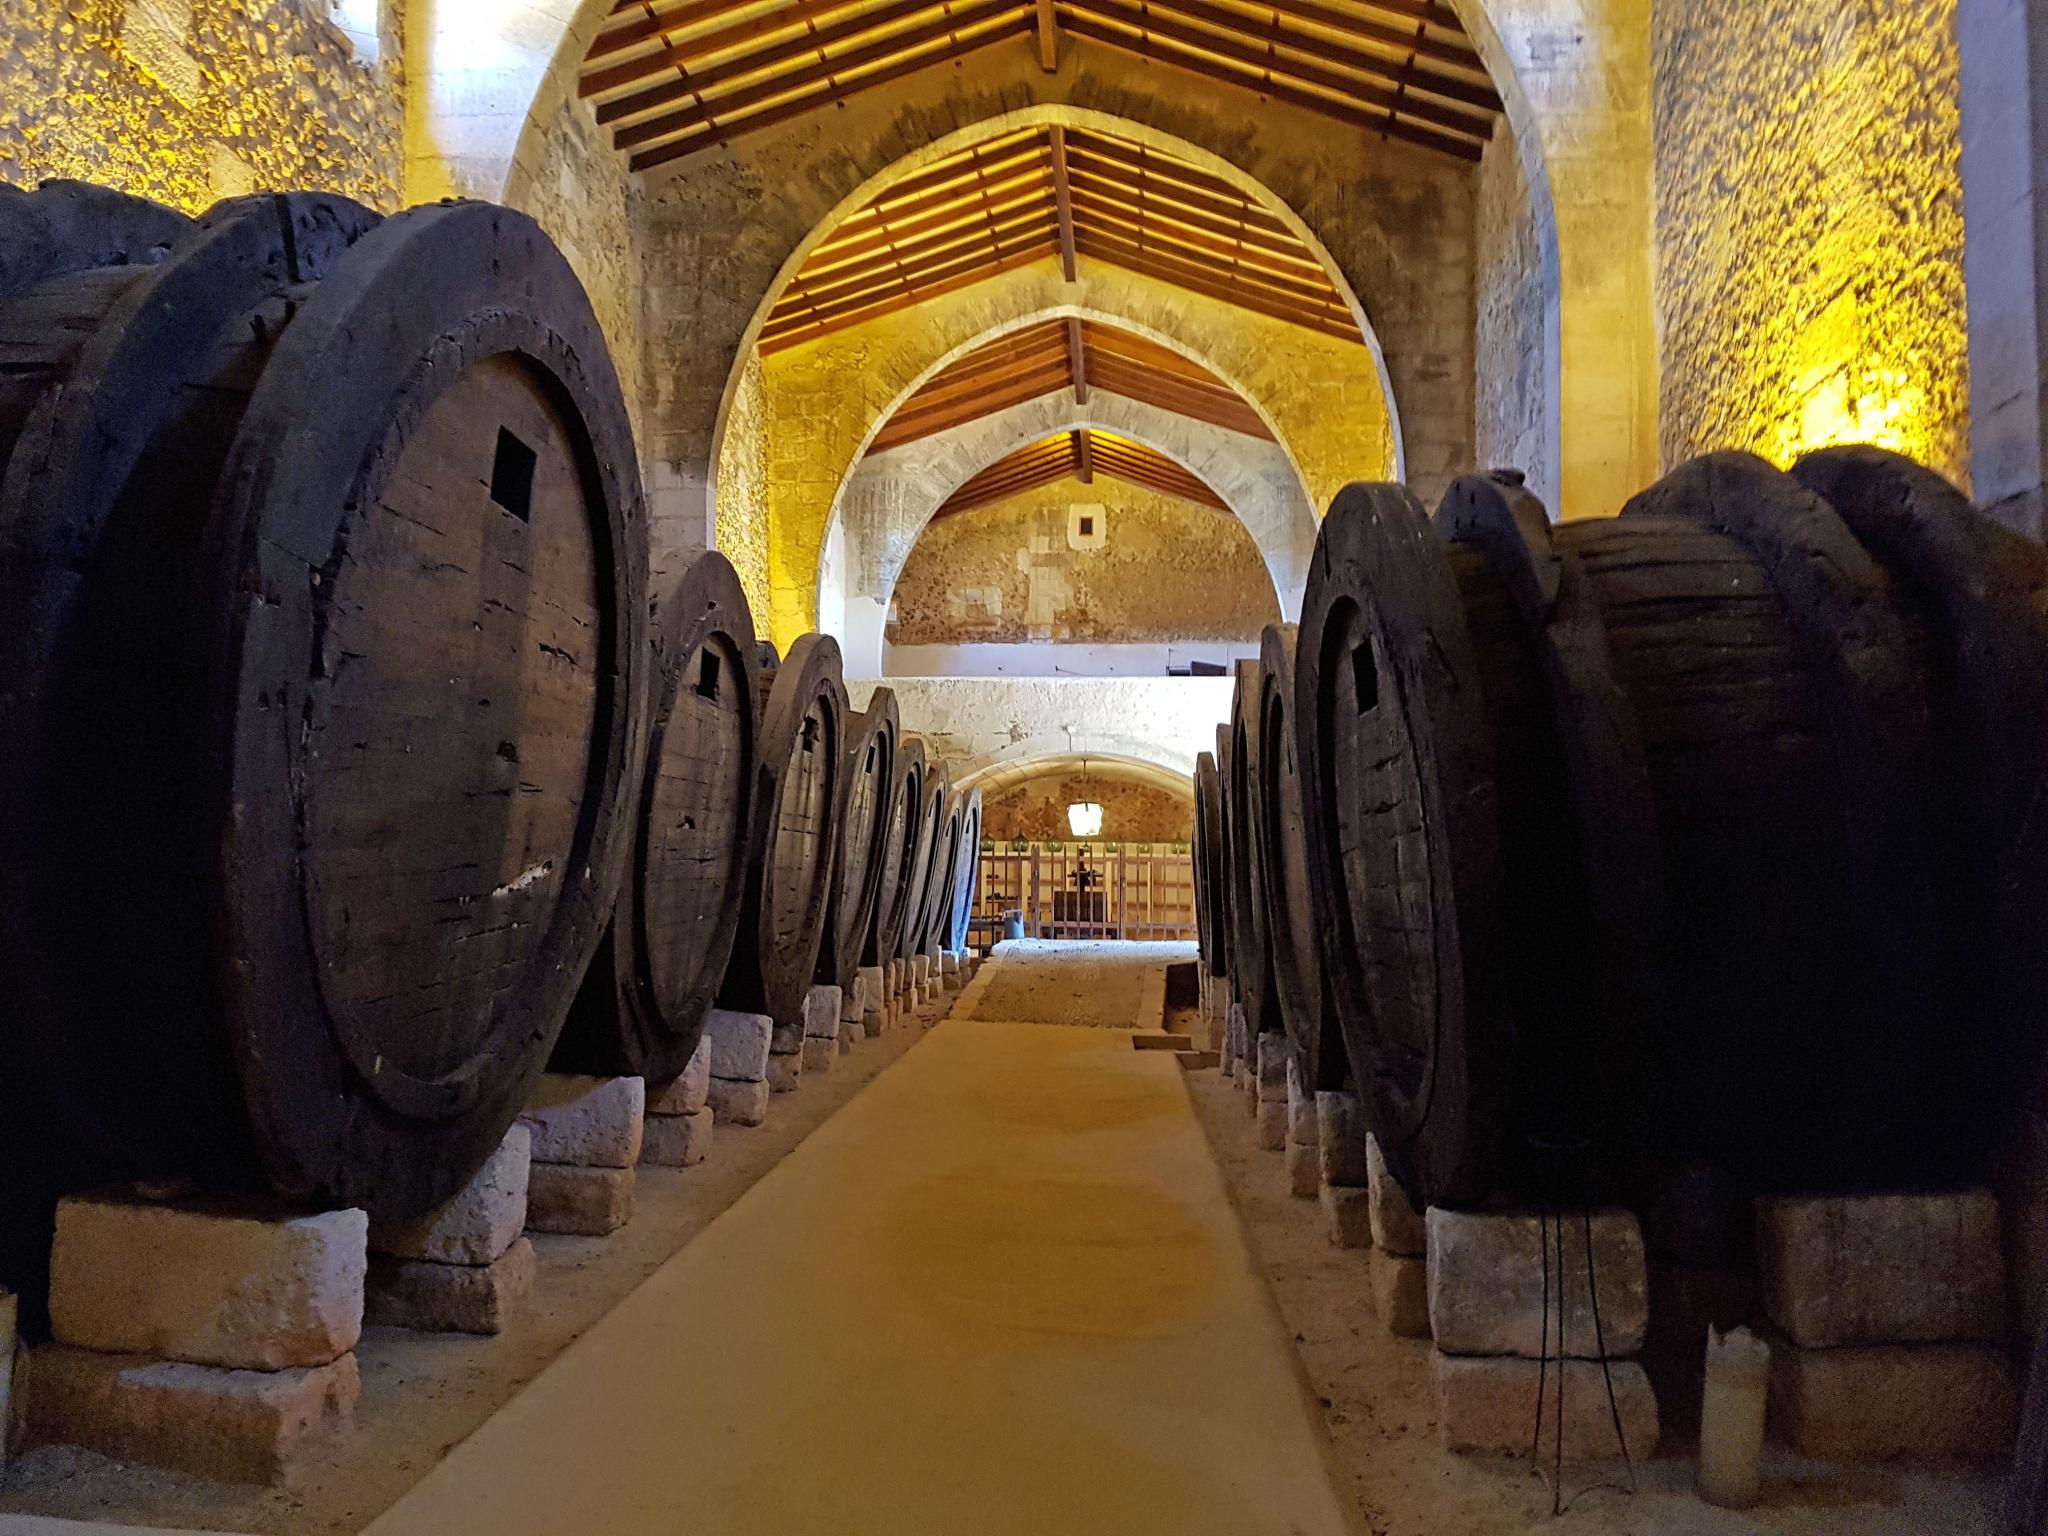 A winery in Mallorca